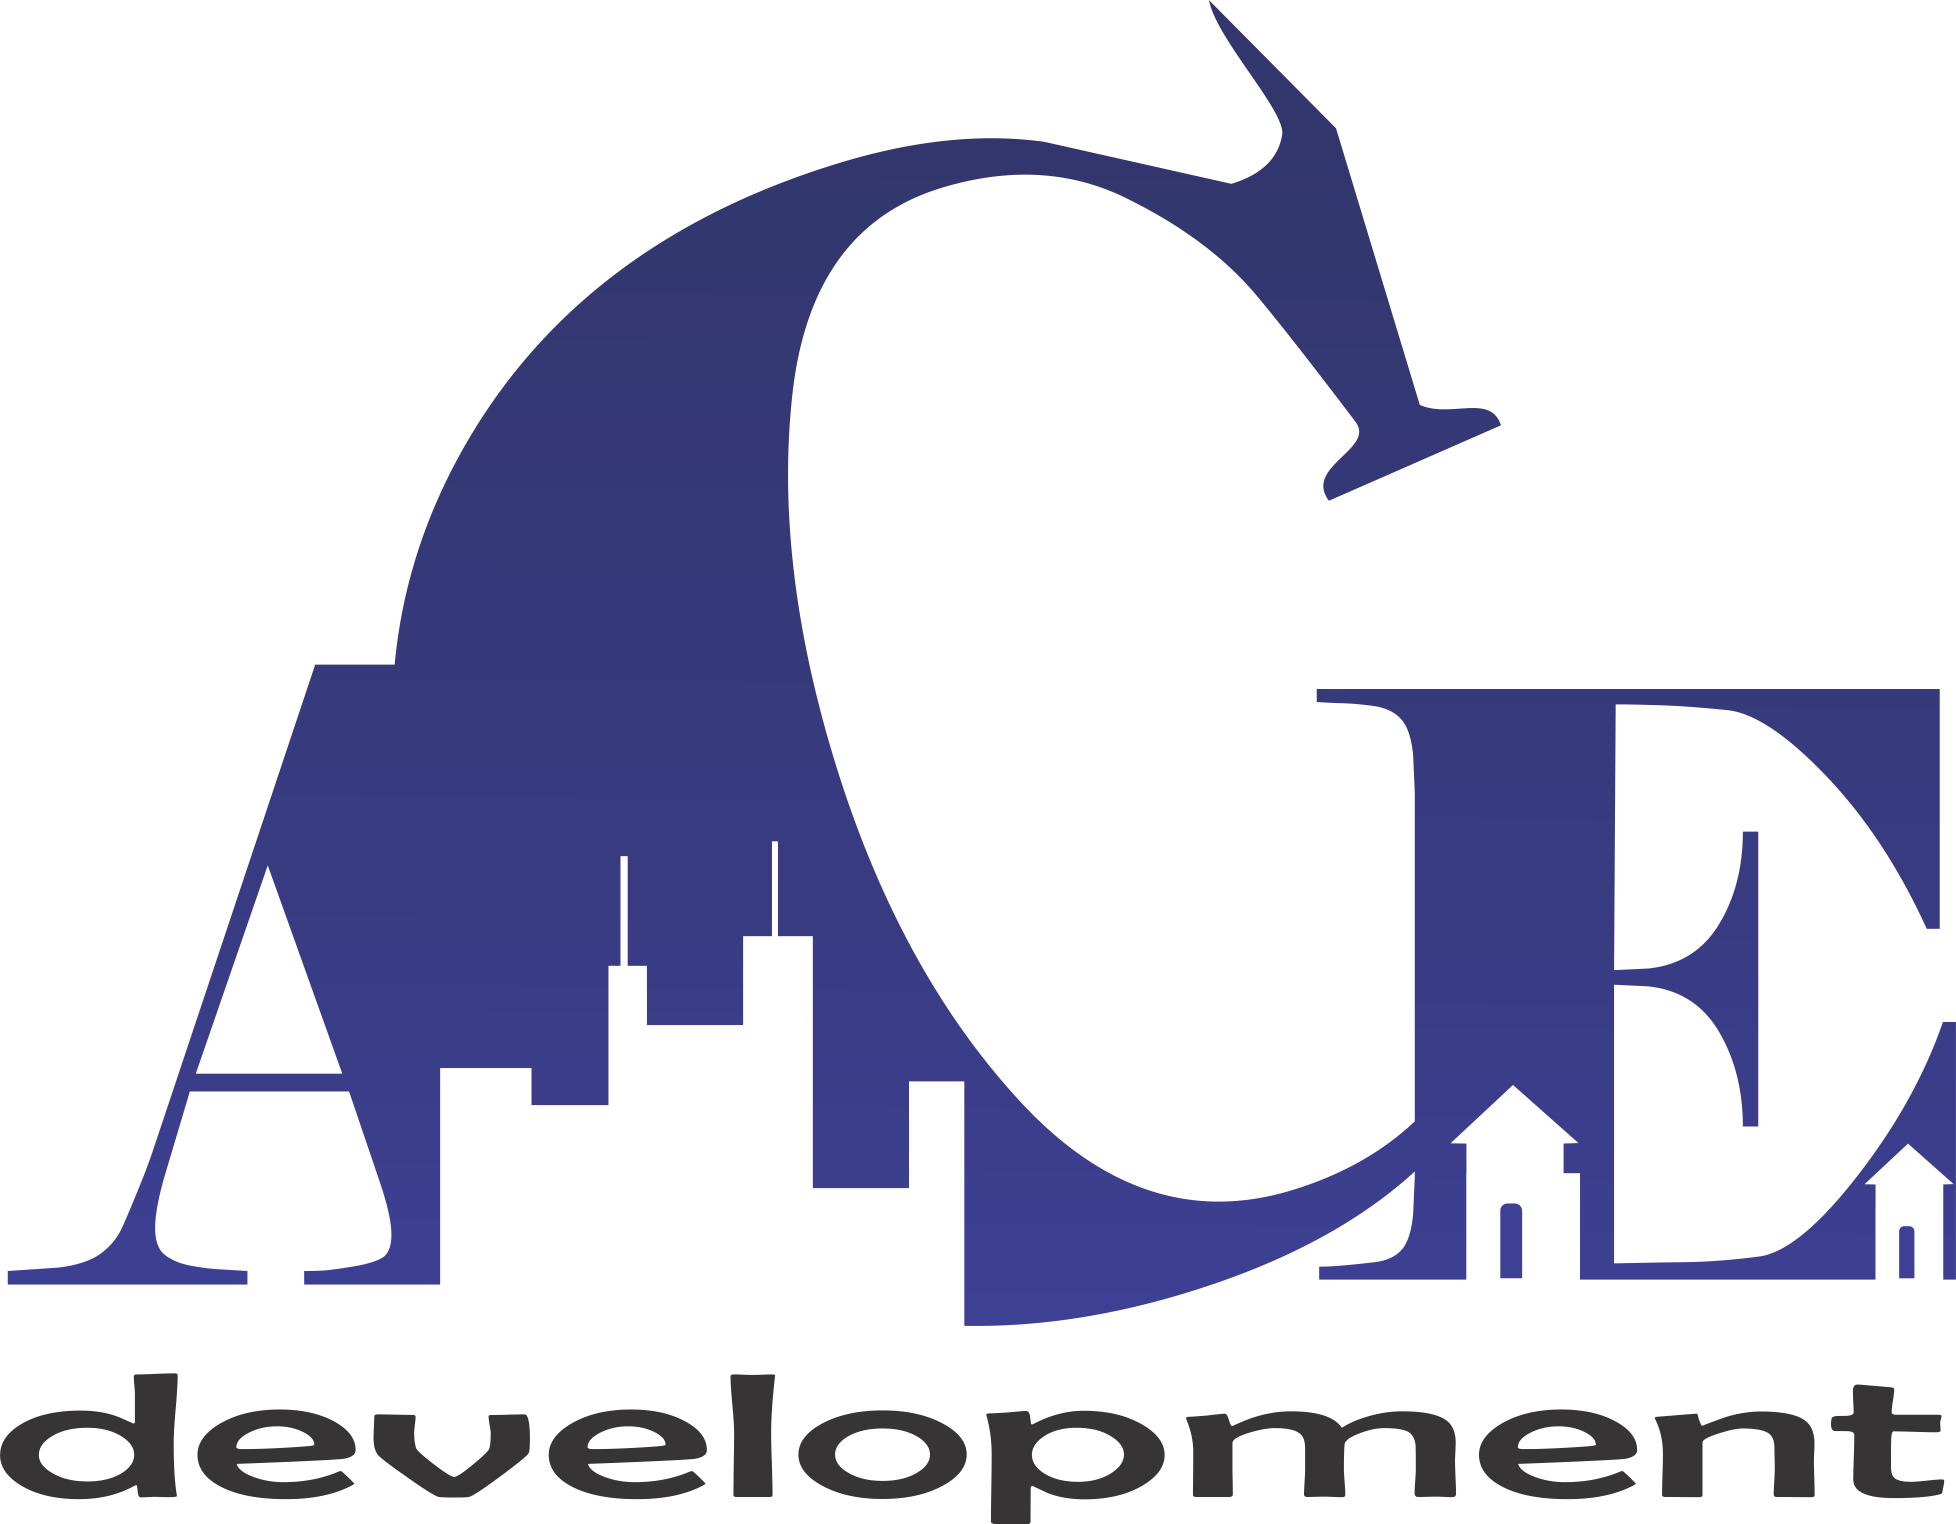 Logo Design by Rudy Permana - Entry No. 73 in the Logo Design Contest Fun Logo Design for Ace development.